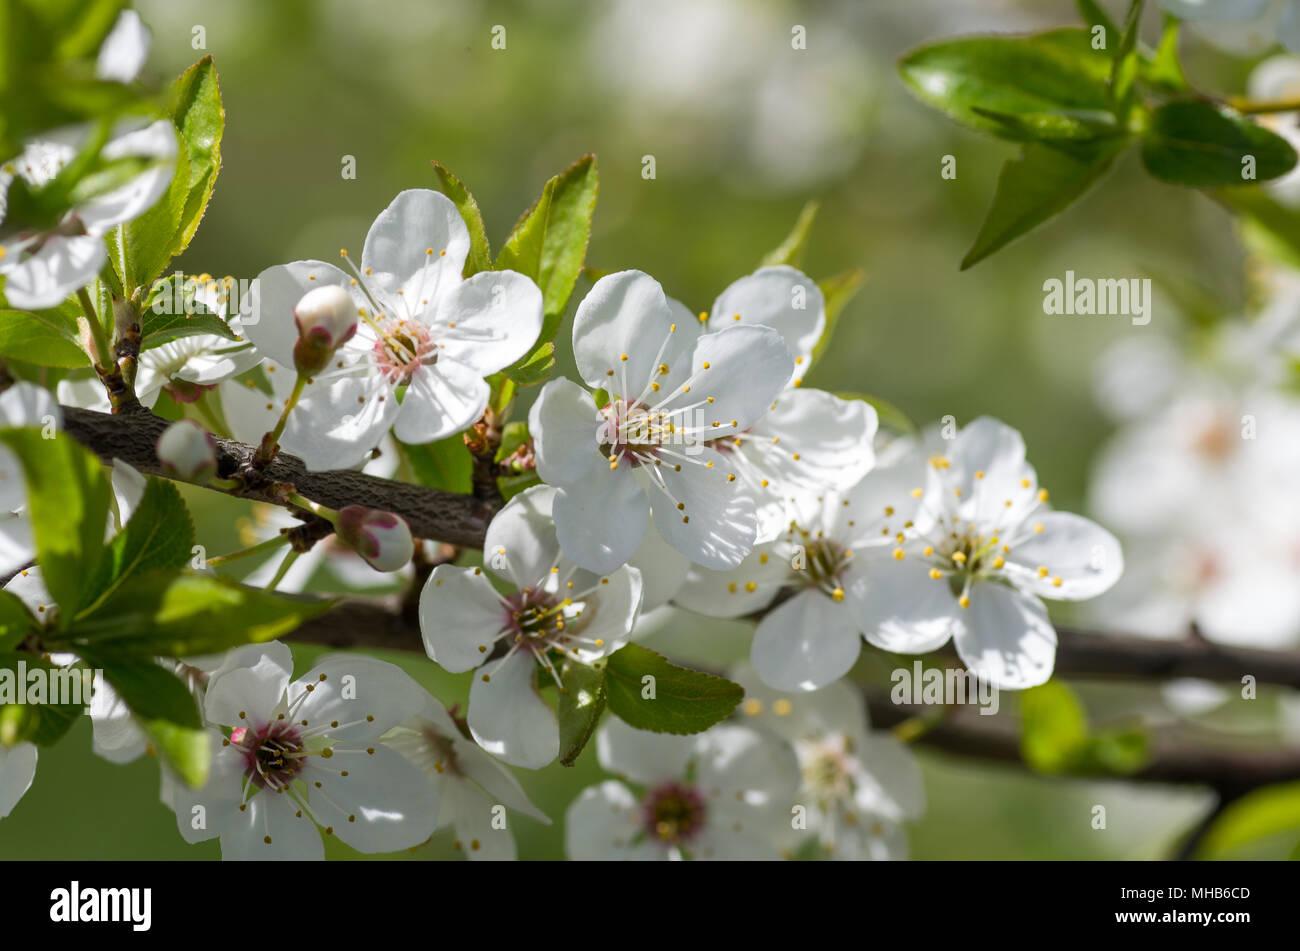 Blooming wild plum tree in daylight white flowers in small clusters blooming wild plum tree in daylight white flowers in small clusters on a wild plum tree branch stock photo 182799357 alamy mightylinksfo